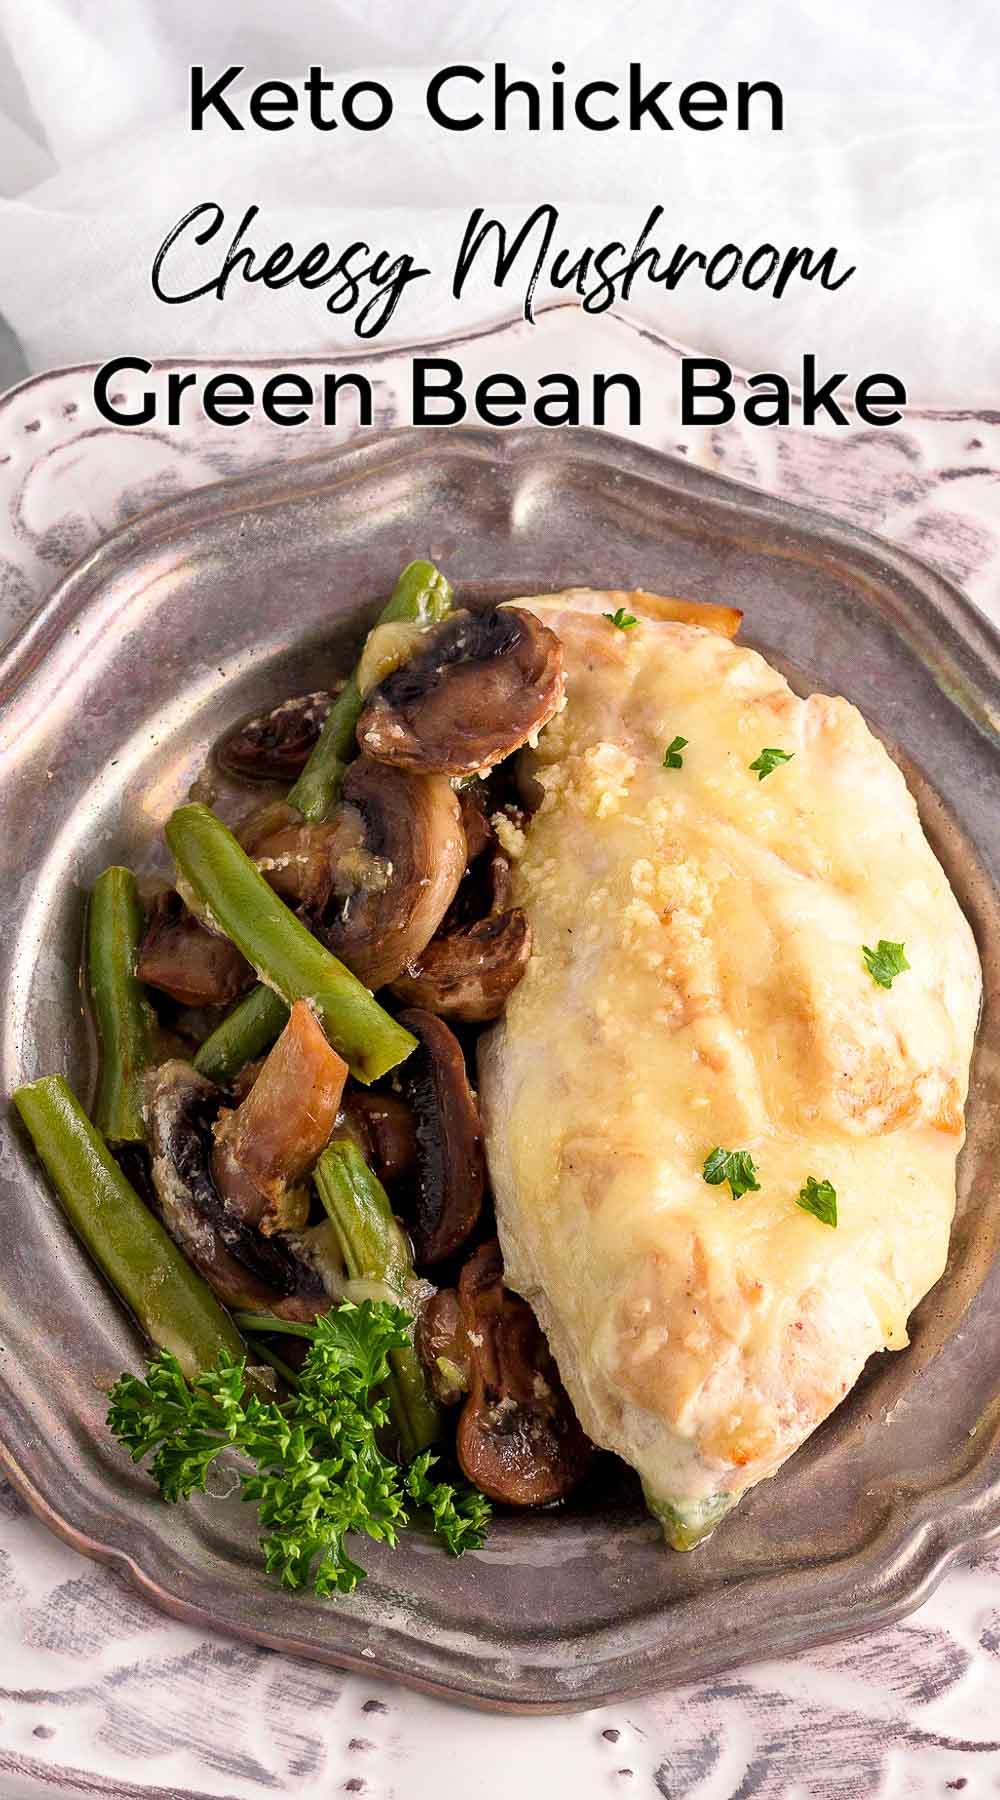 A one dish chicken mushroom green bean entrée in a cream sauce